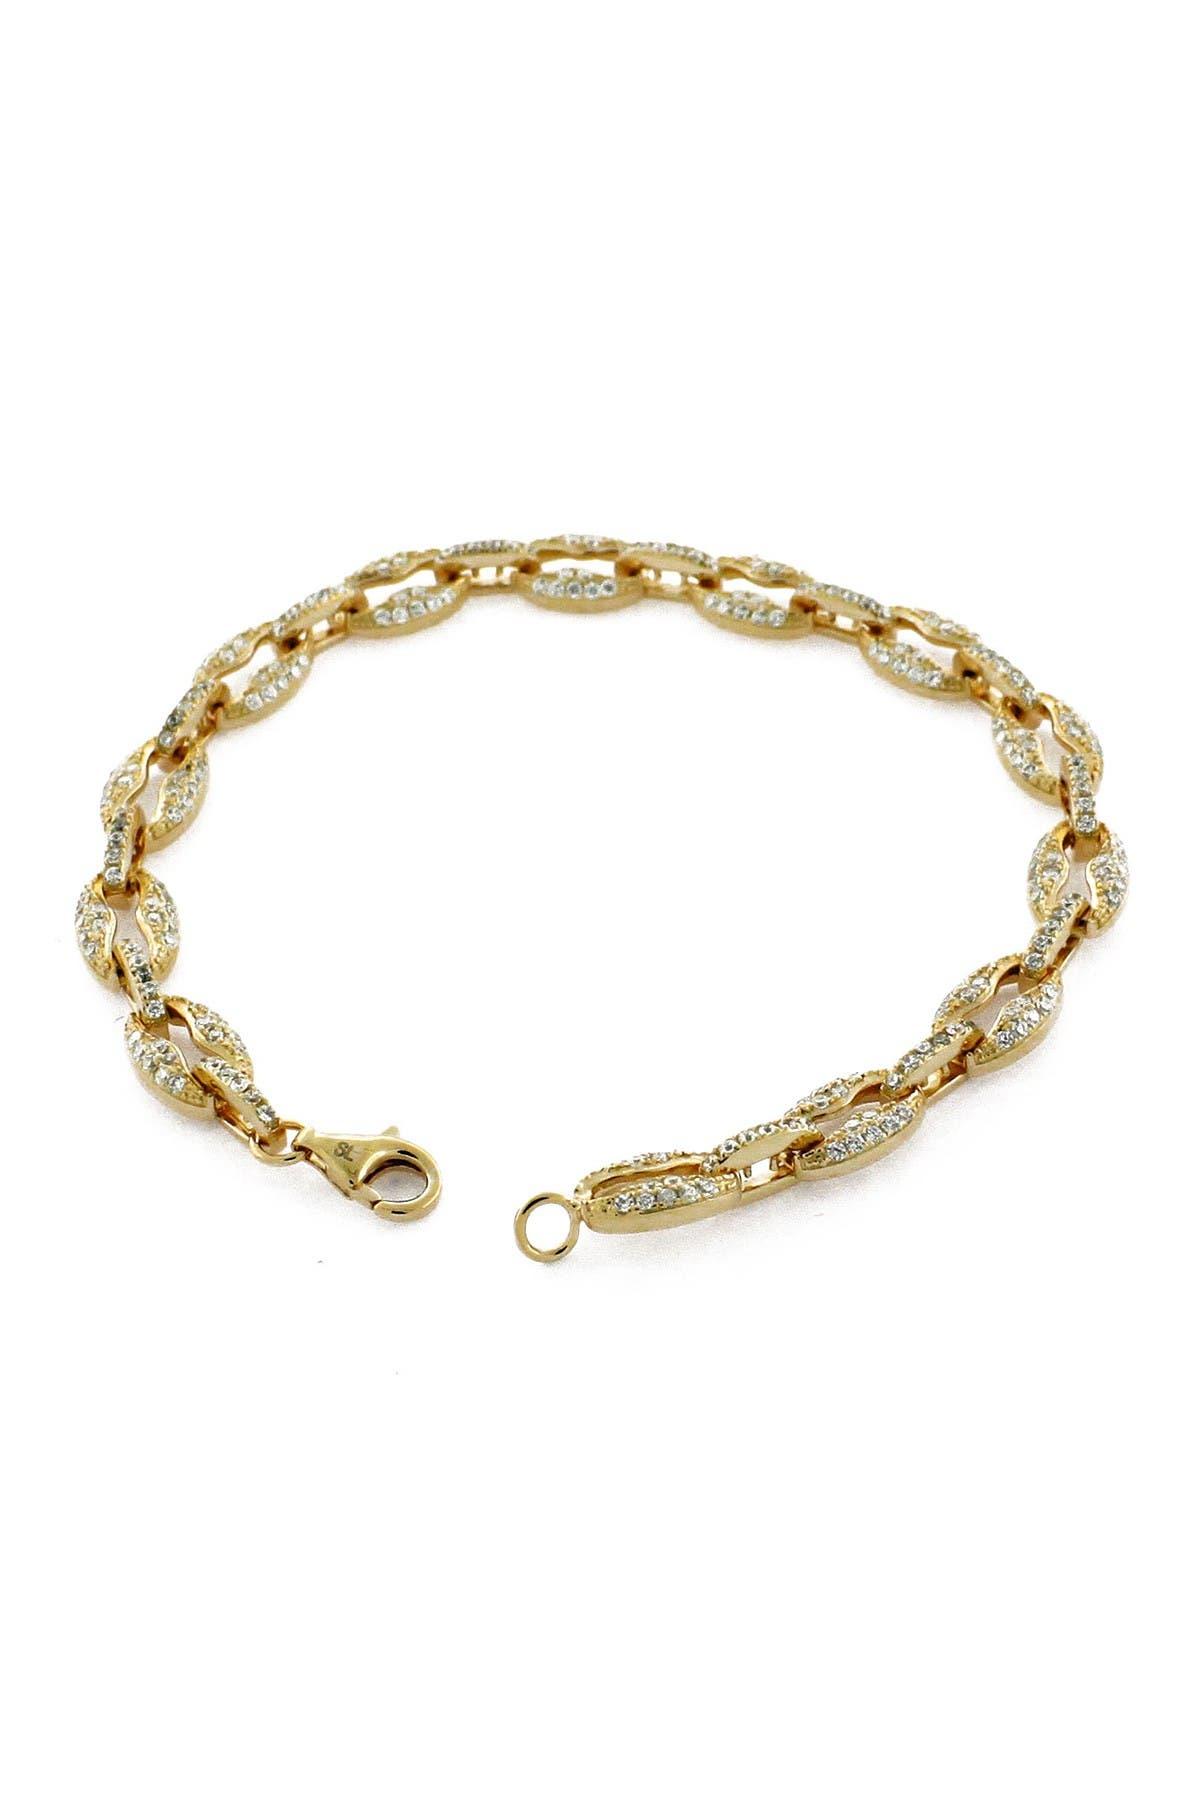 Image of Suzy Levian Pave CZ Gold Plated Sterling Silver Link Bracelet